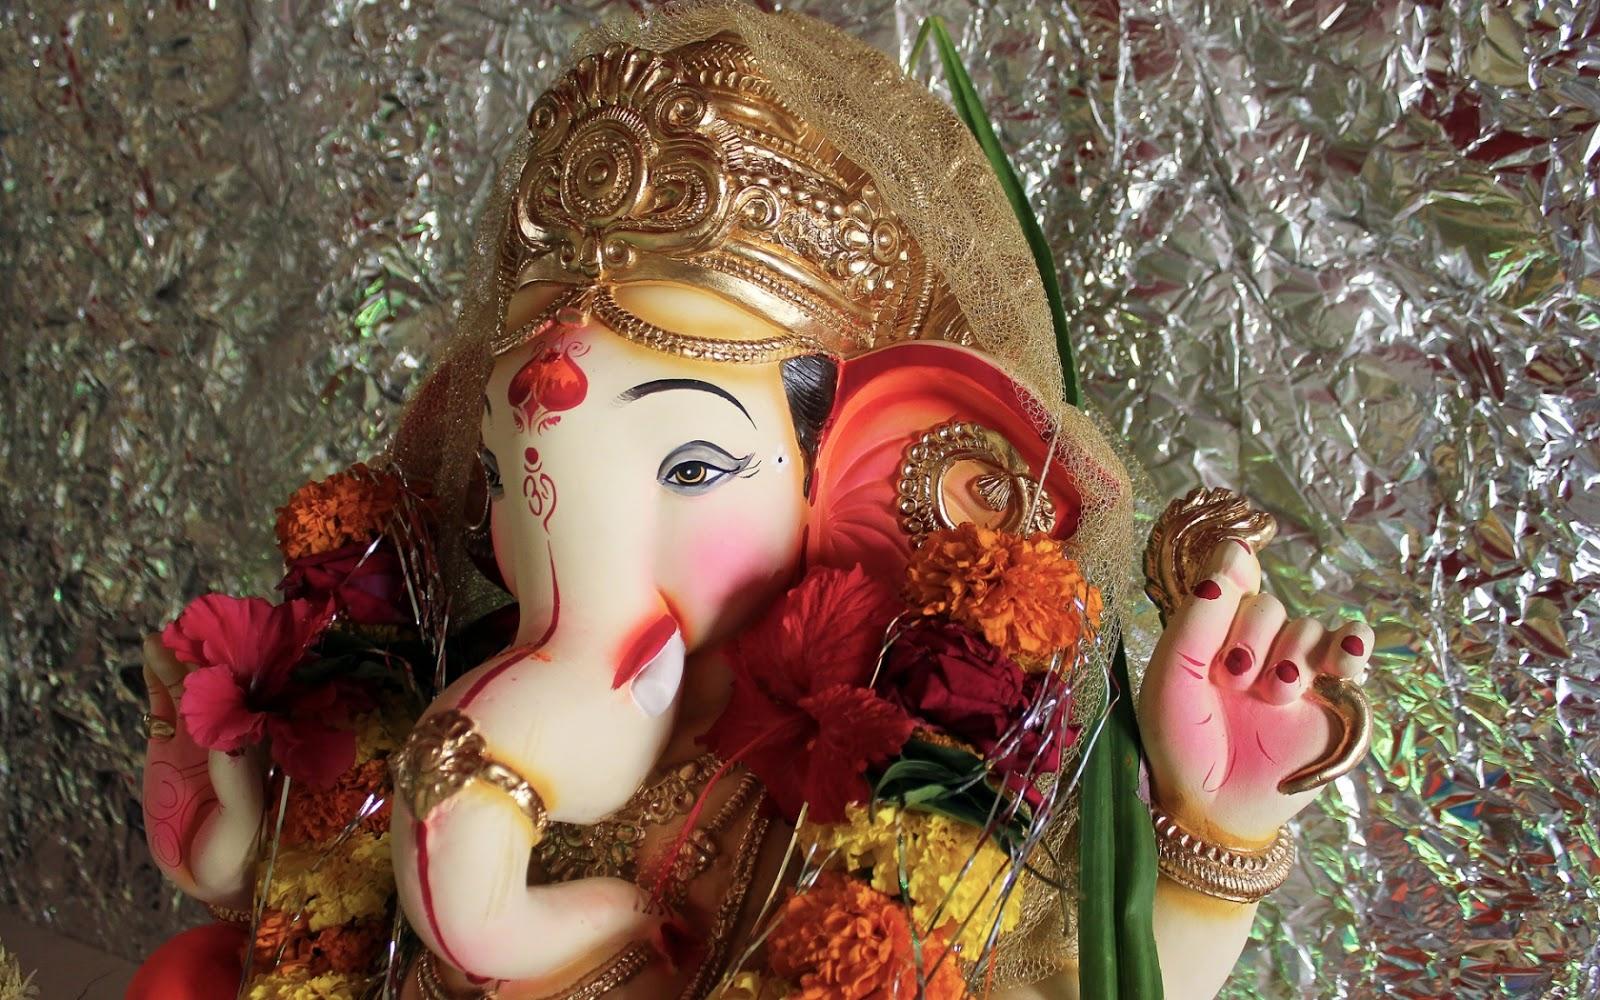 25 best ganesha wallpapers series 1 free wallpapers - Sri ganesh wallpaper hd ...